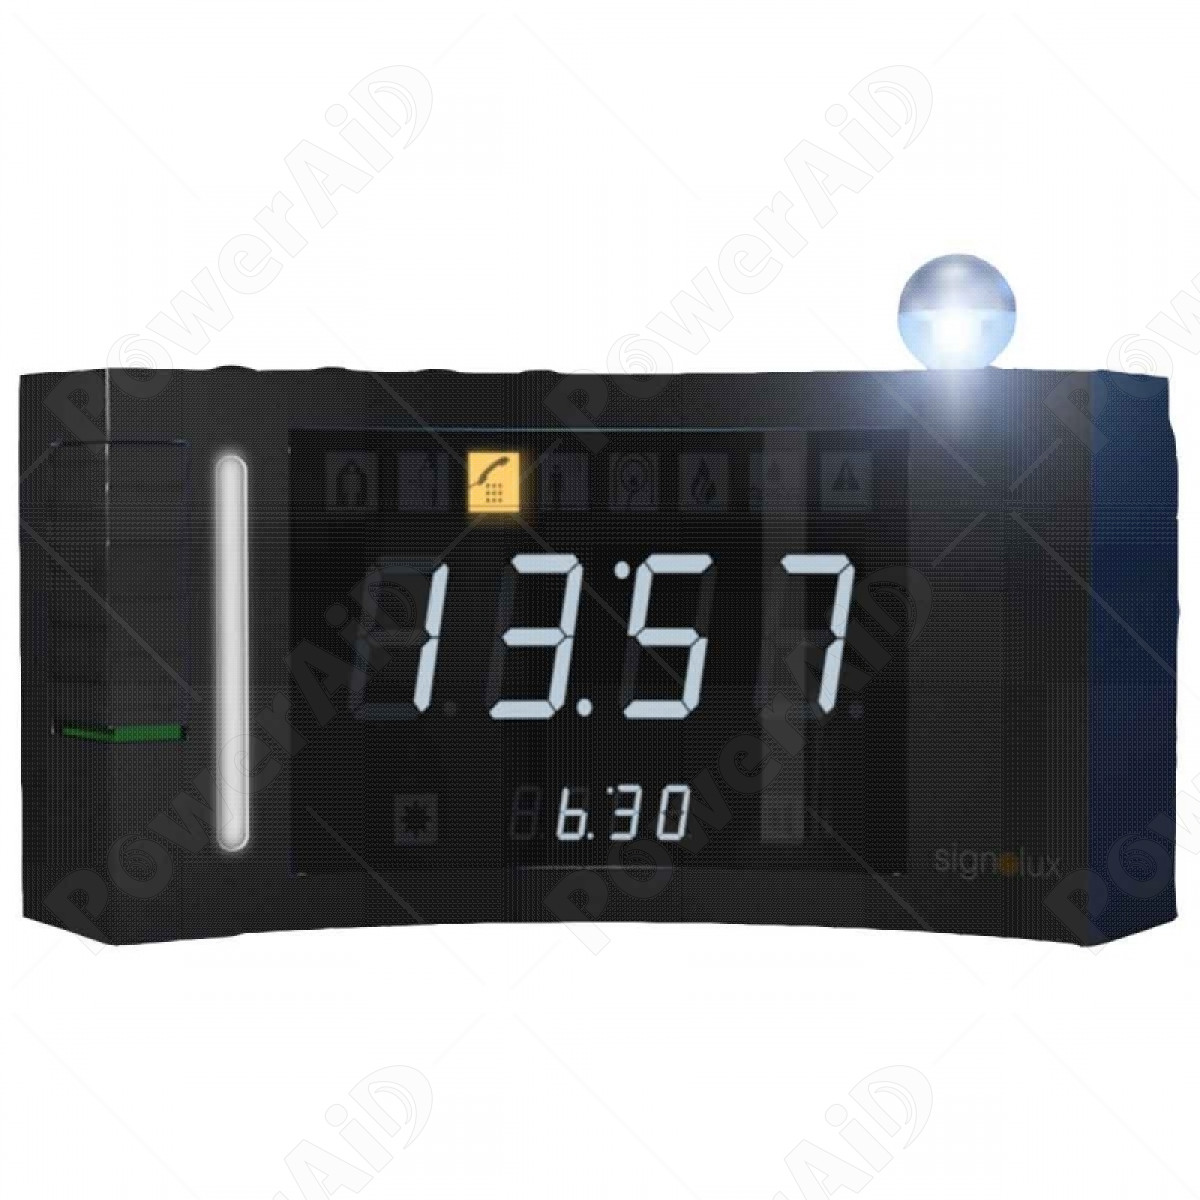 Humantechnik - Sveglia digitale DS-2 con Ricevitore Signolux